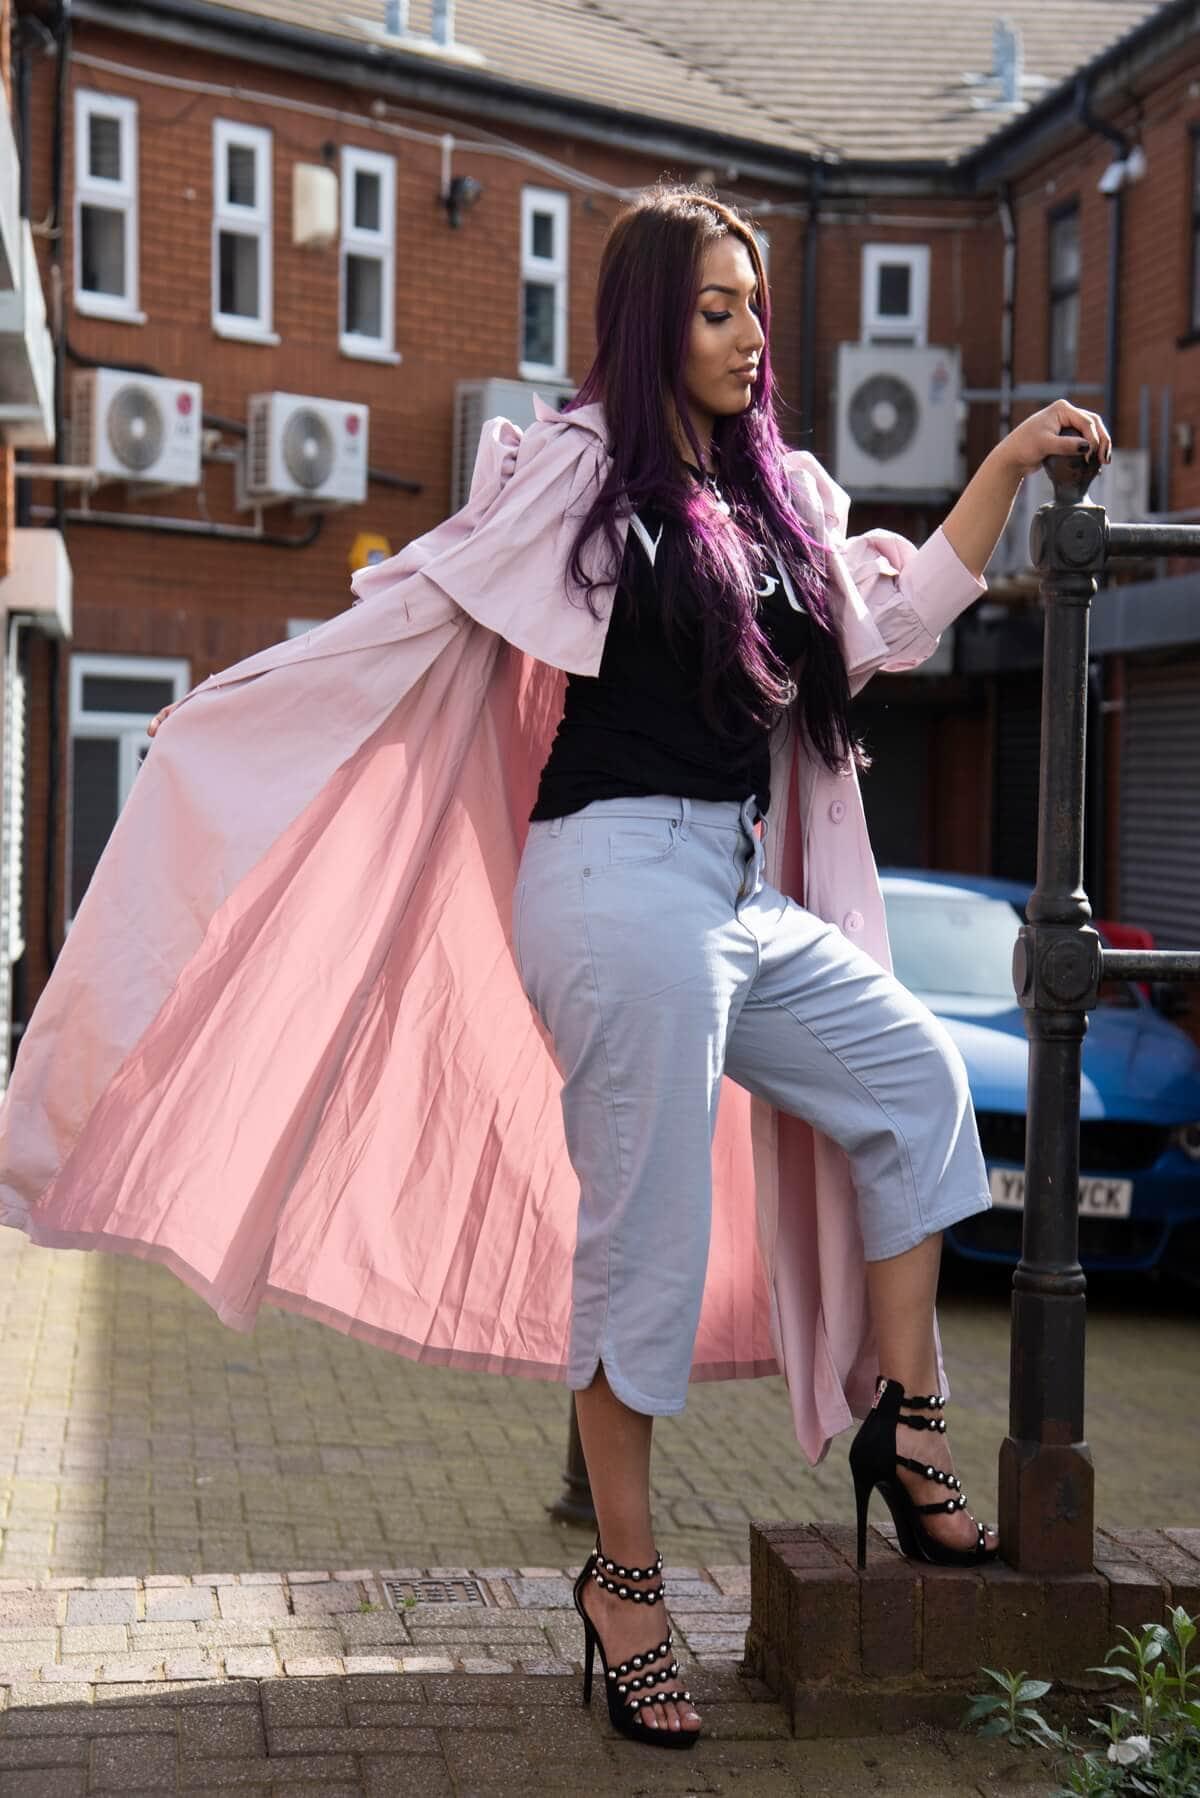 Posing perfection stylish photography Birmingham